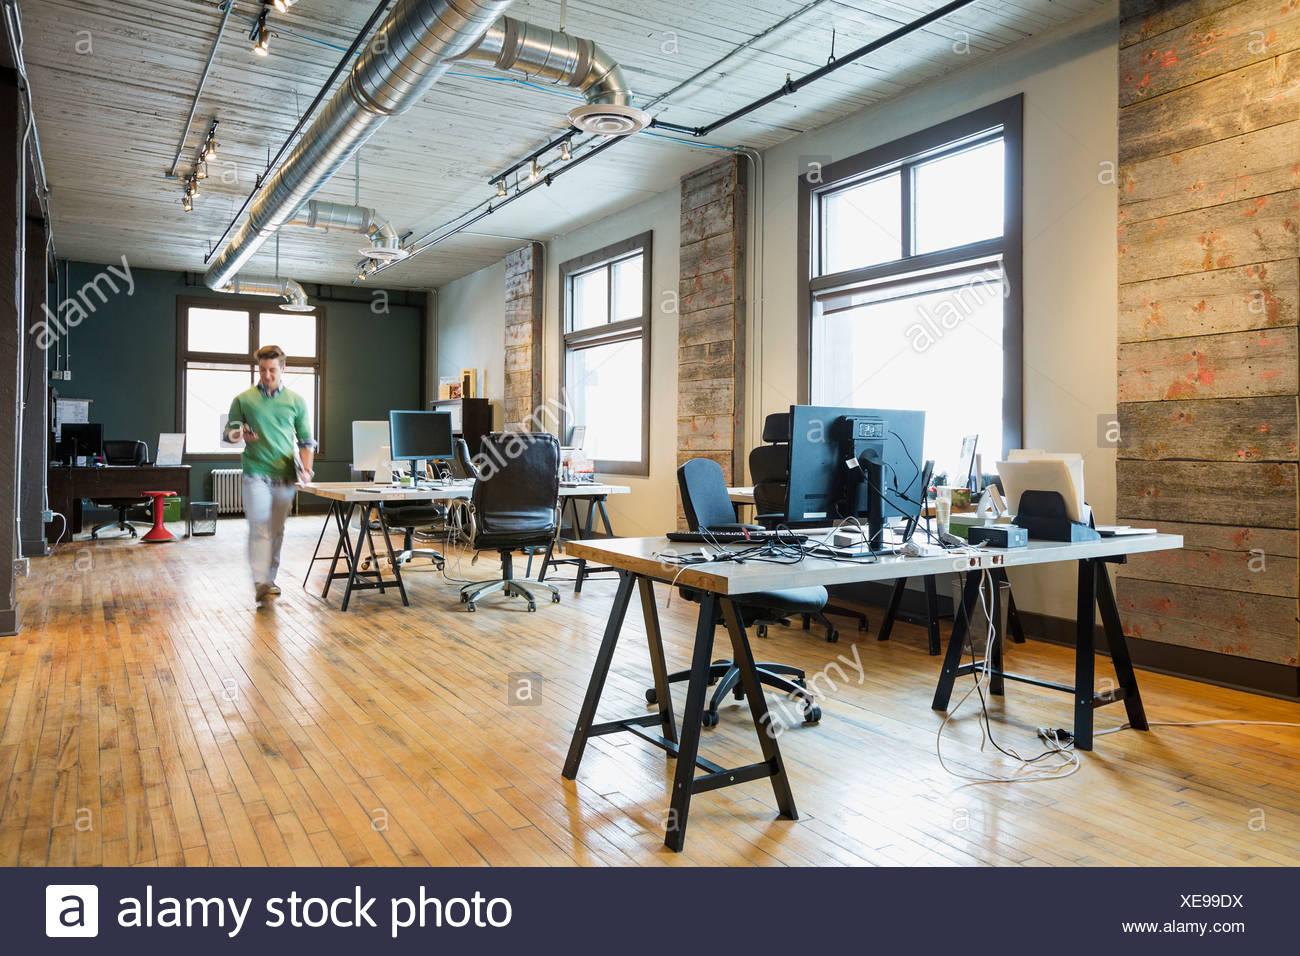 Charming Entrepreneur Walking In Creative Office Space